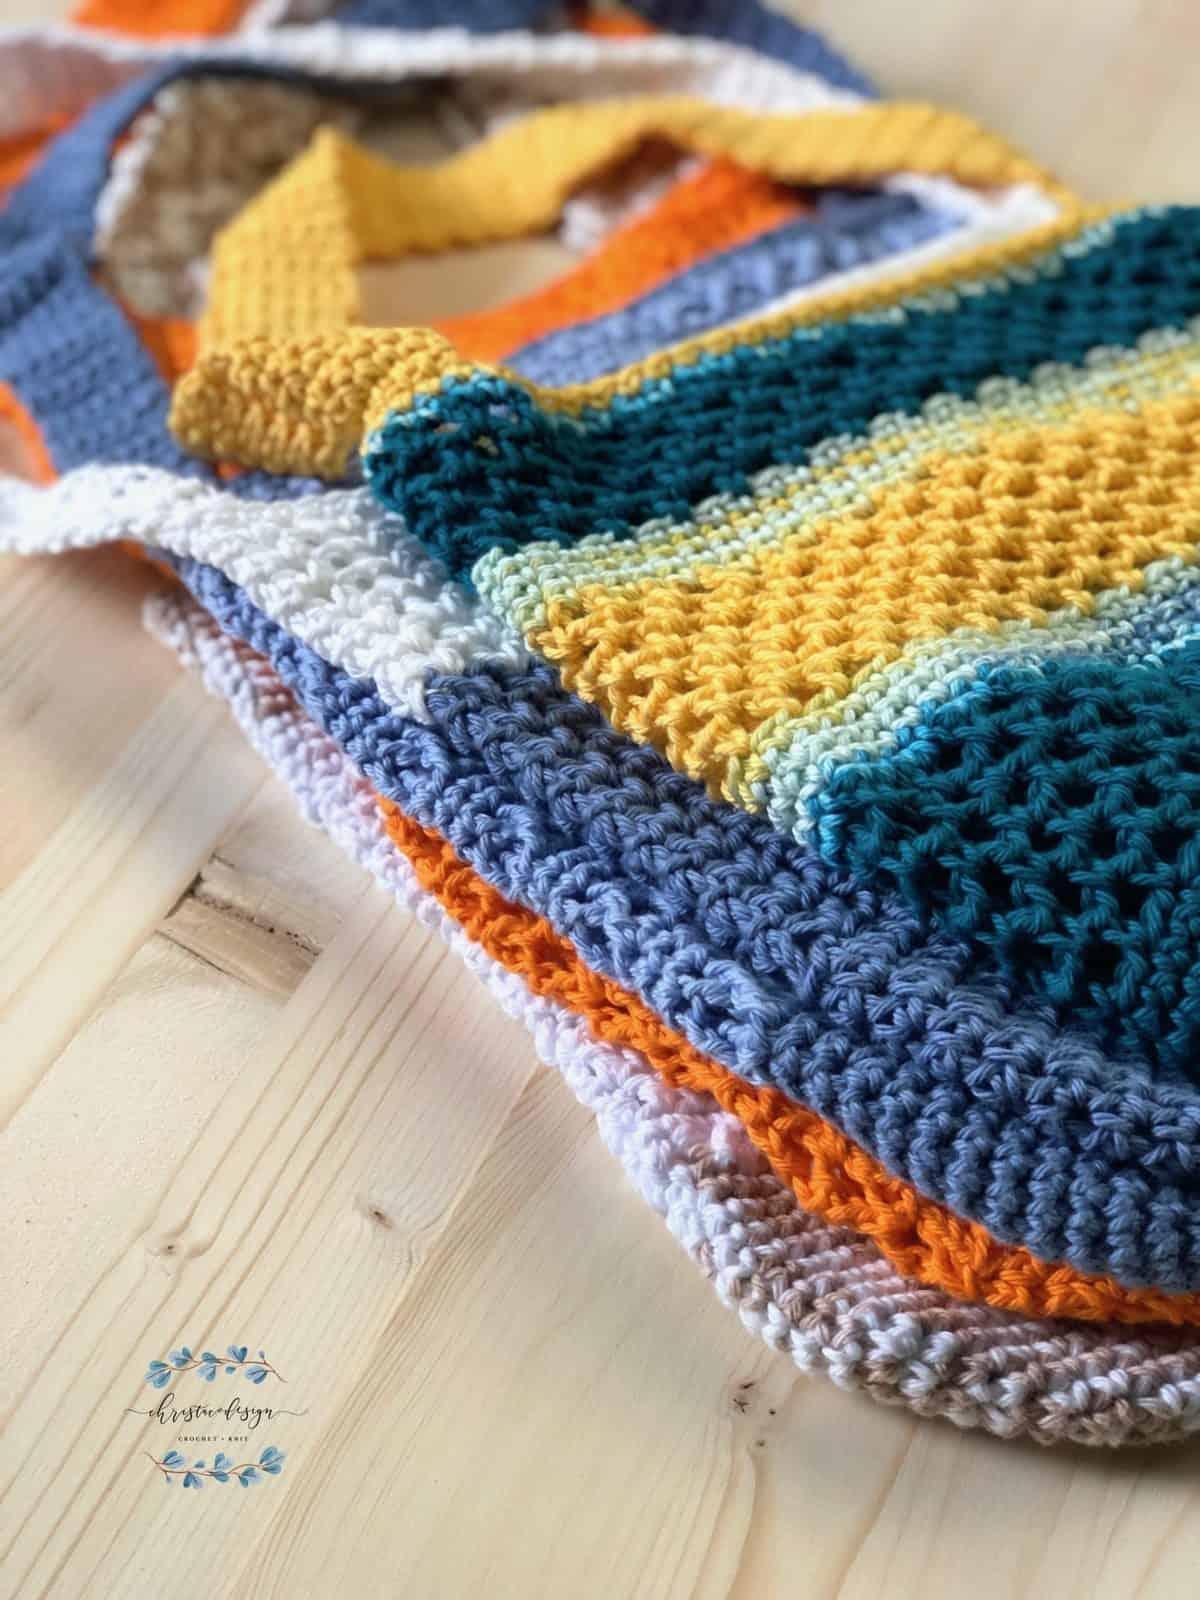 Coastal sun tote on stack of free crochet market bag patterns.